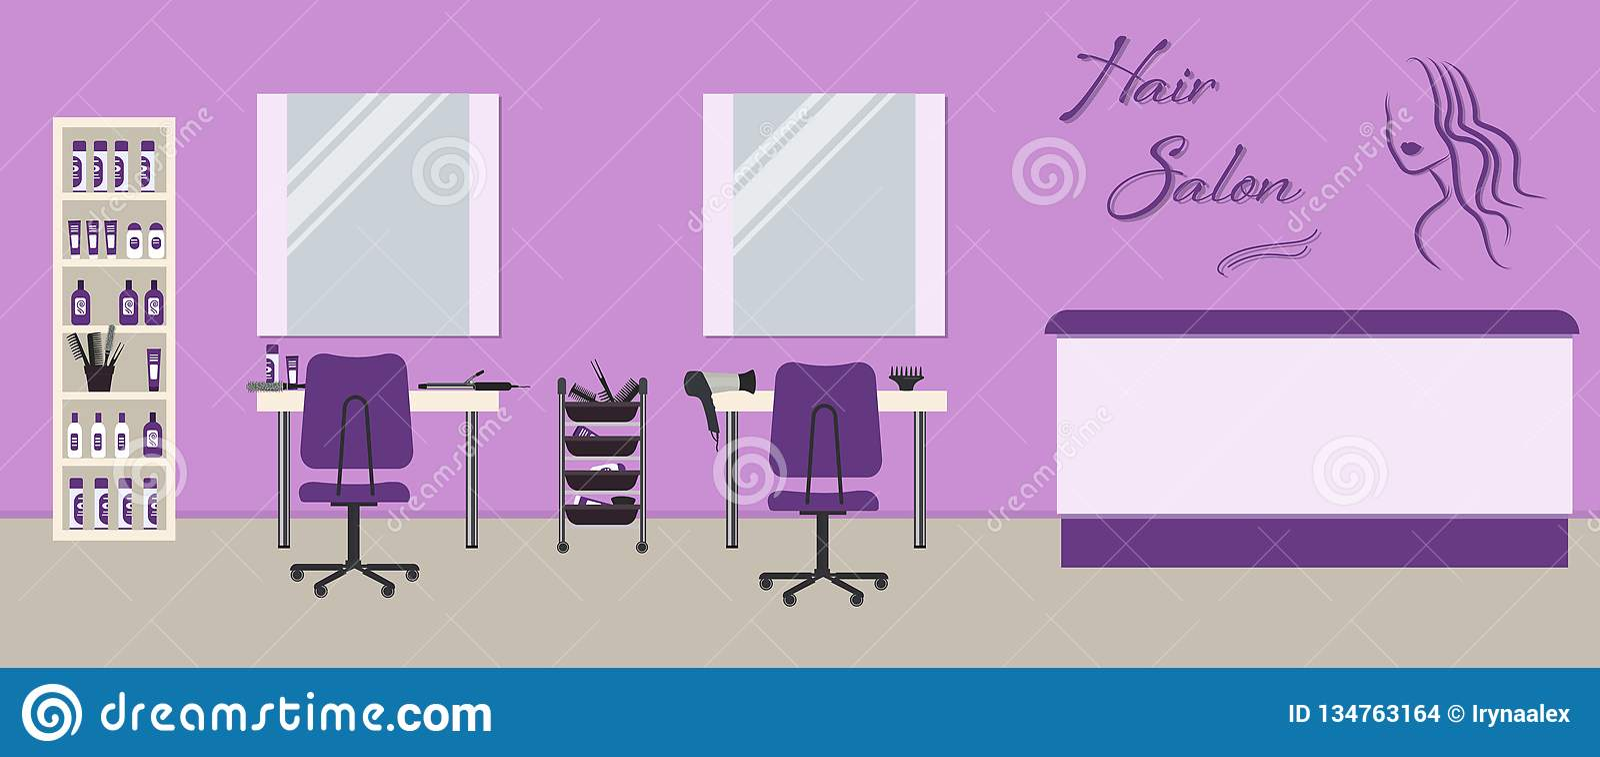 Hair Salon Interior In A Purple Color Beauty Salon Stock Vector